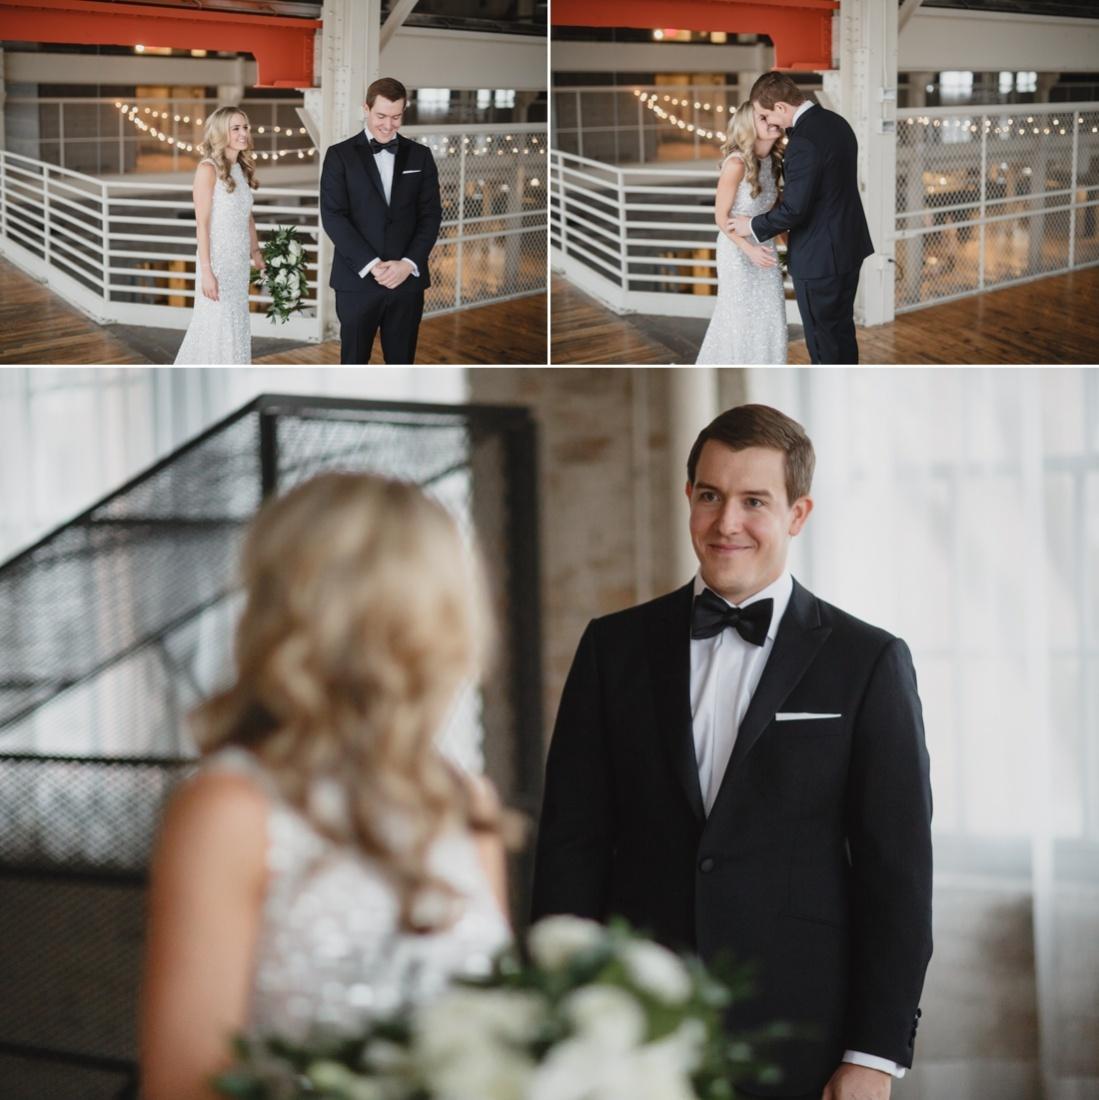 07_Minneapolis_Machine_Shop_Wedding-1099x1100.jpg